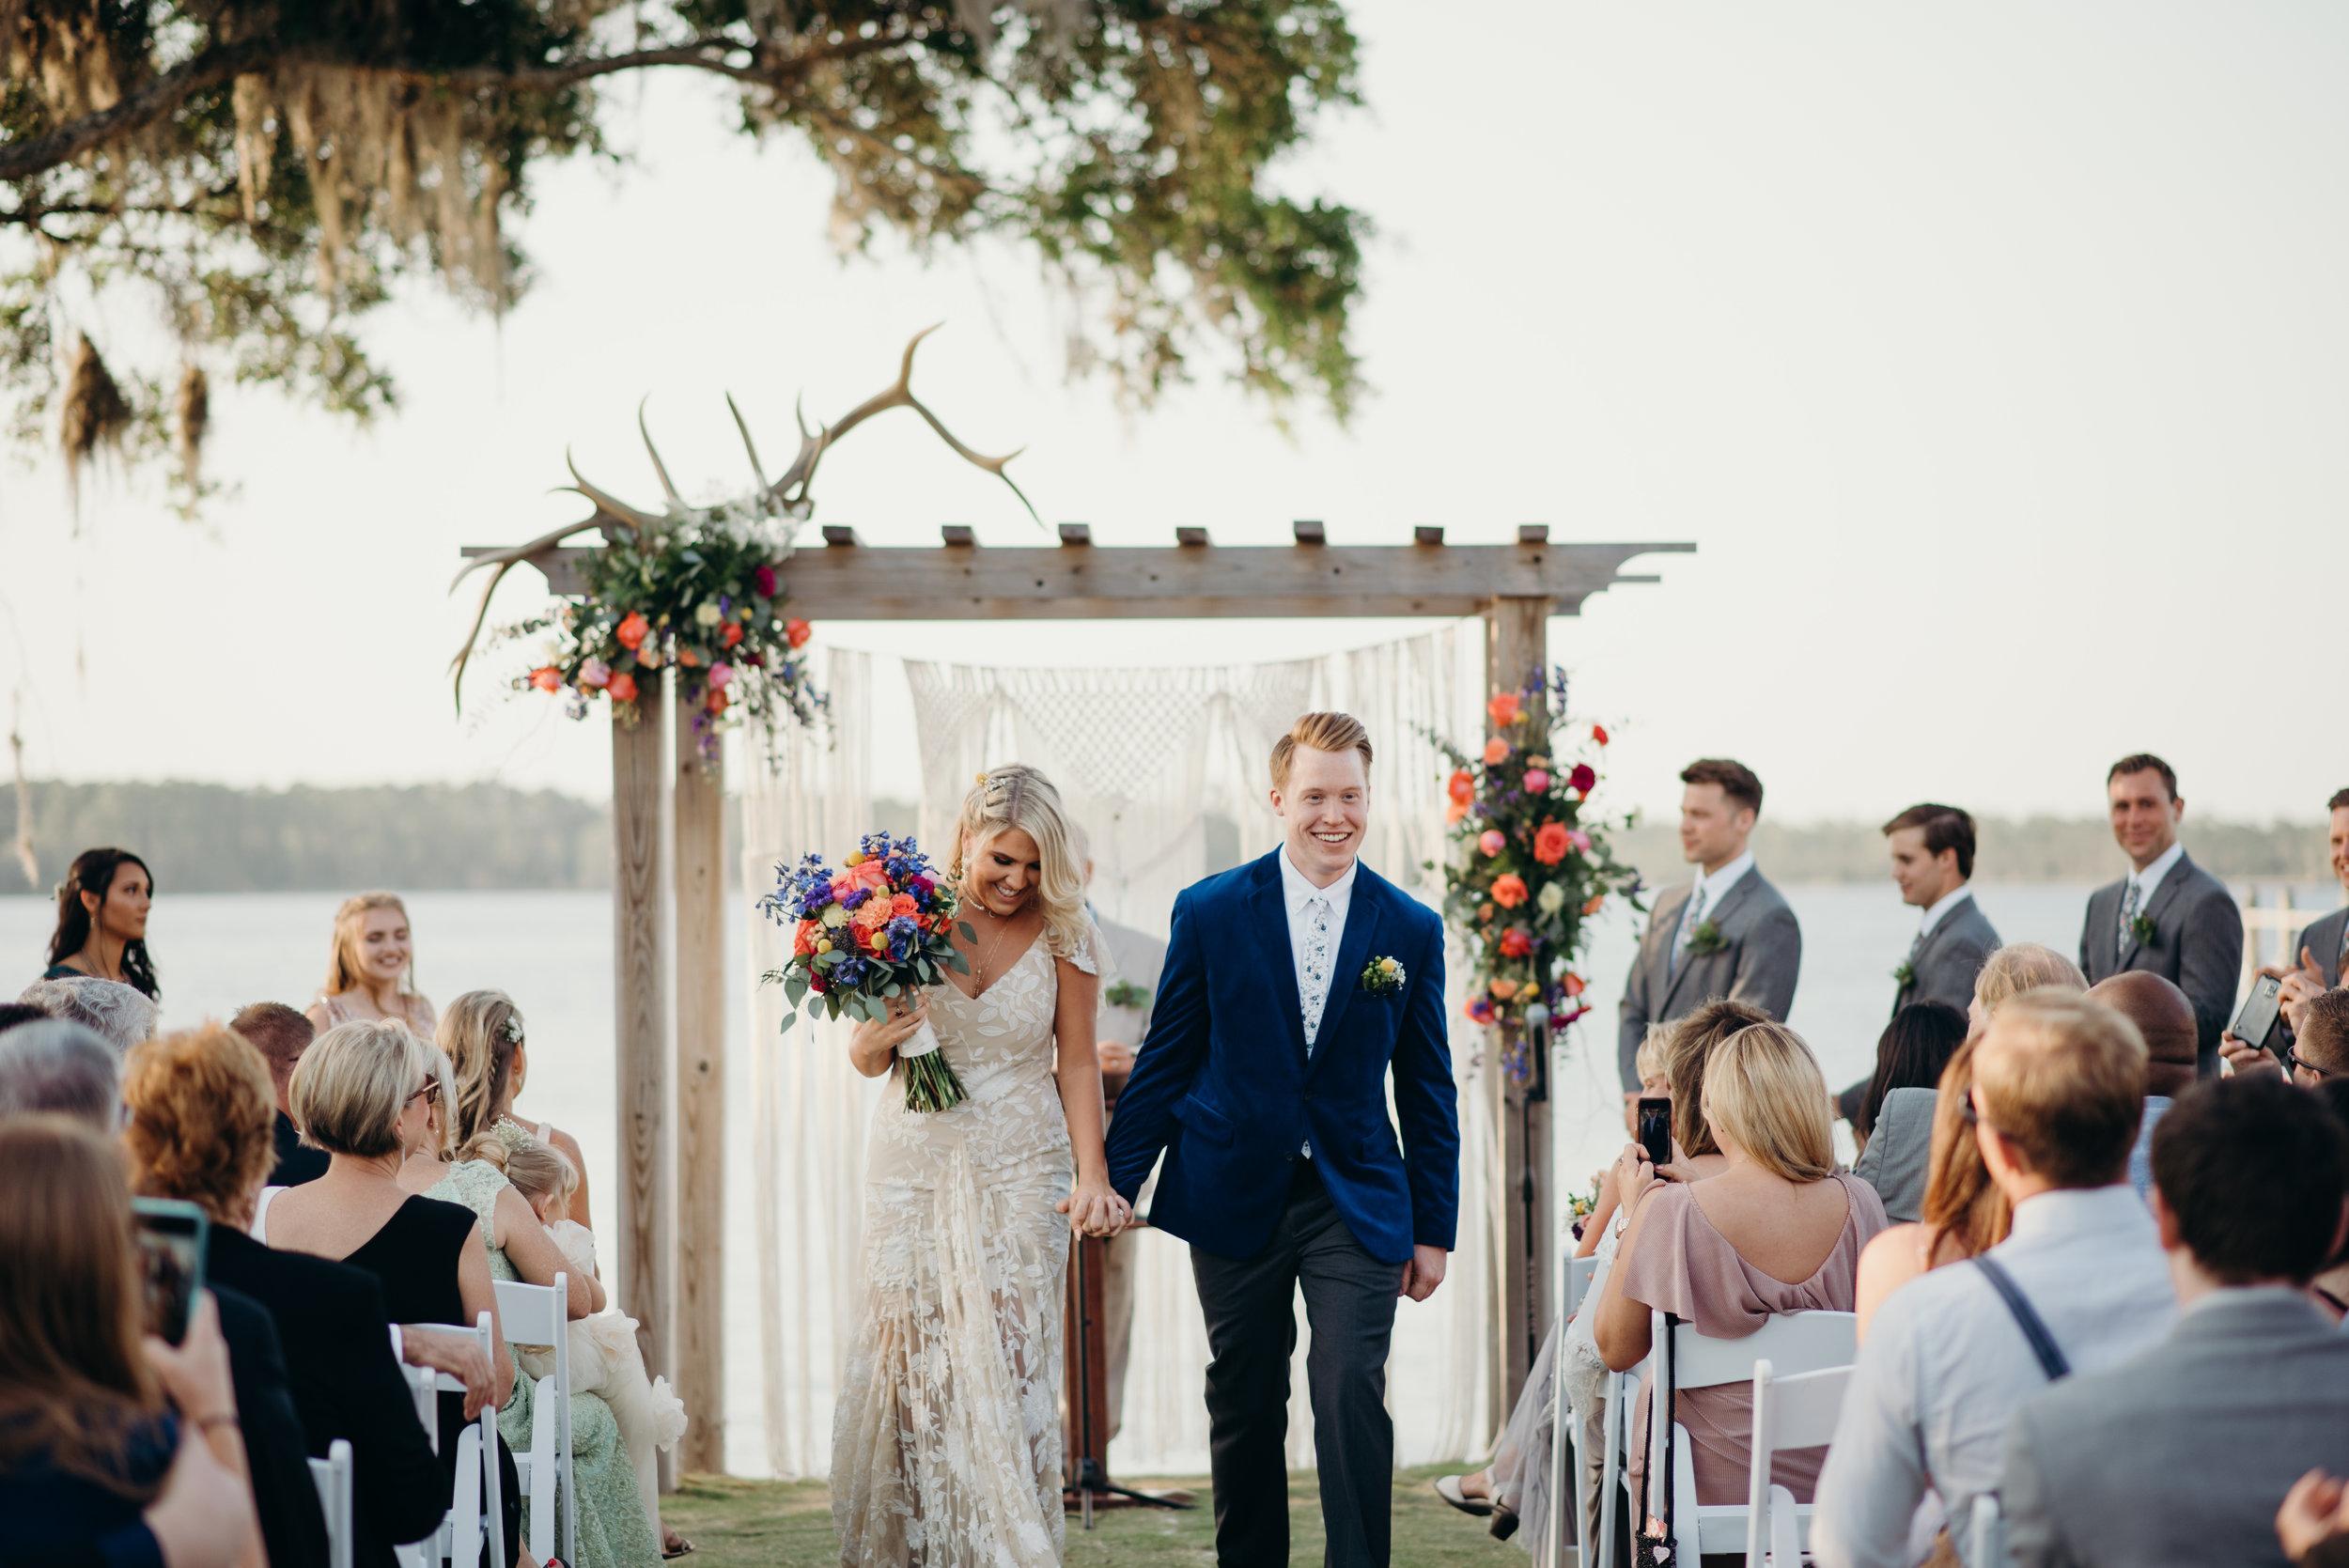 zayda-collin-panama-city-wedding-photography-trippy-bohemian-lisa-frank-wedding-ceremony-87.jpg